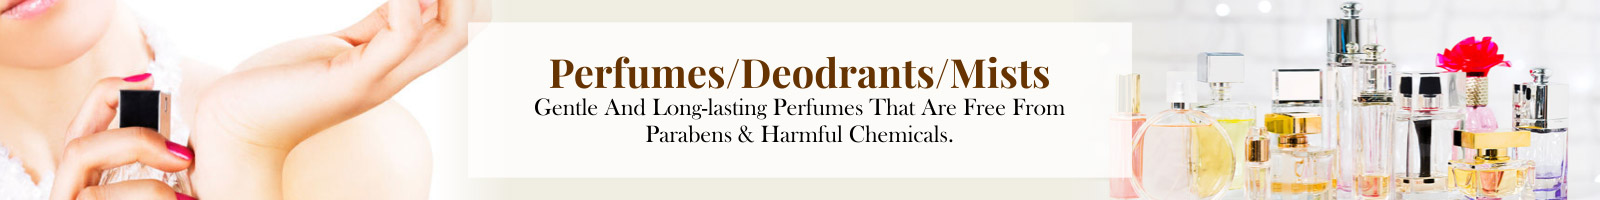 Perfumes & Deodorant sprays